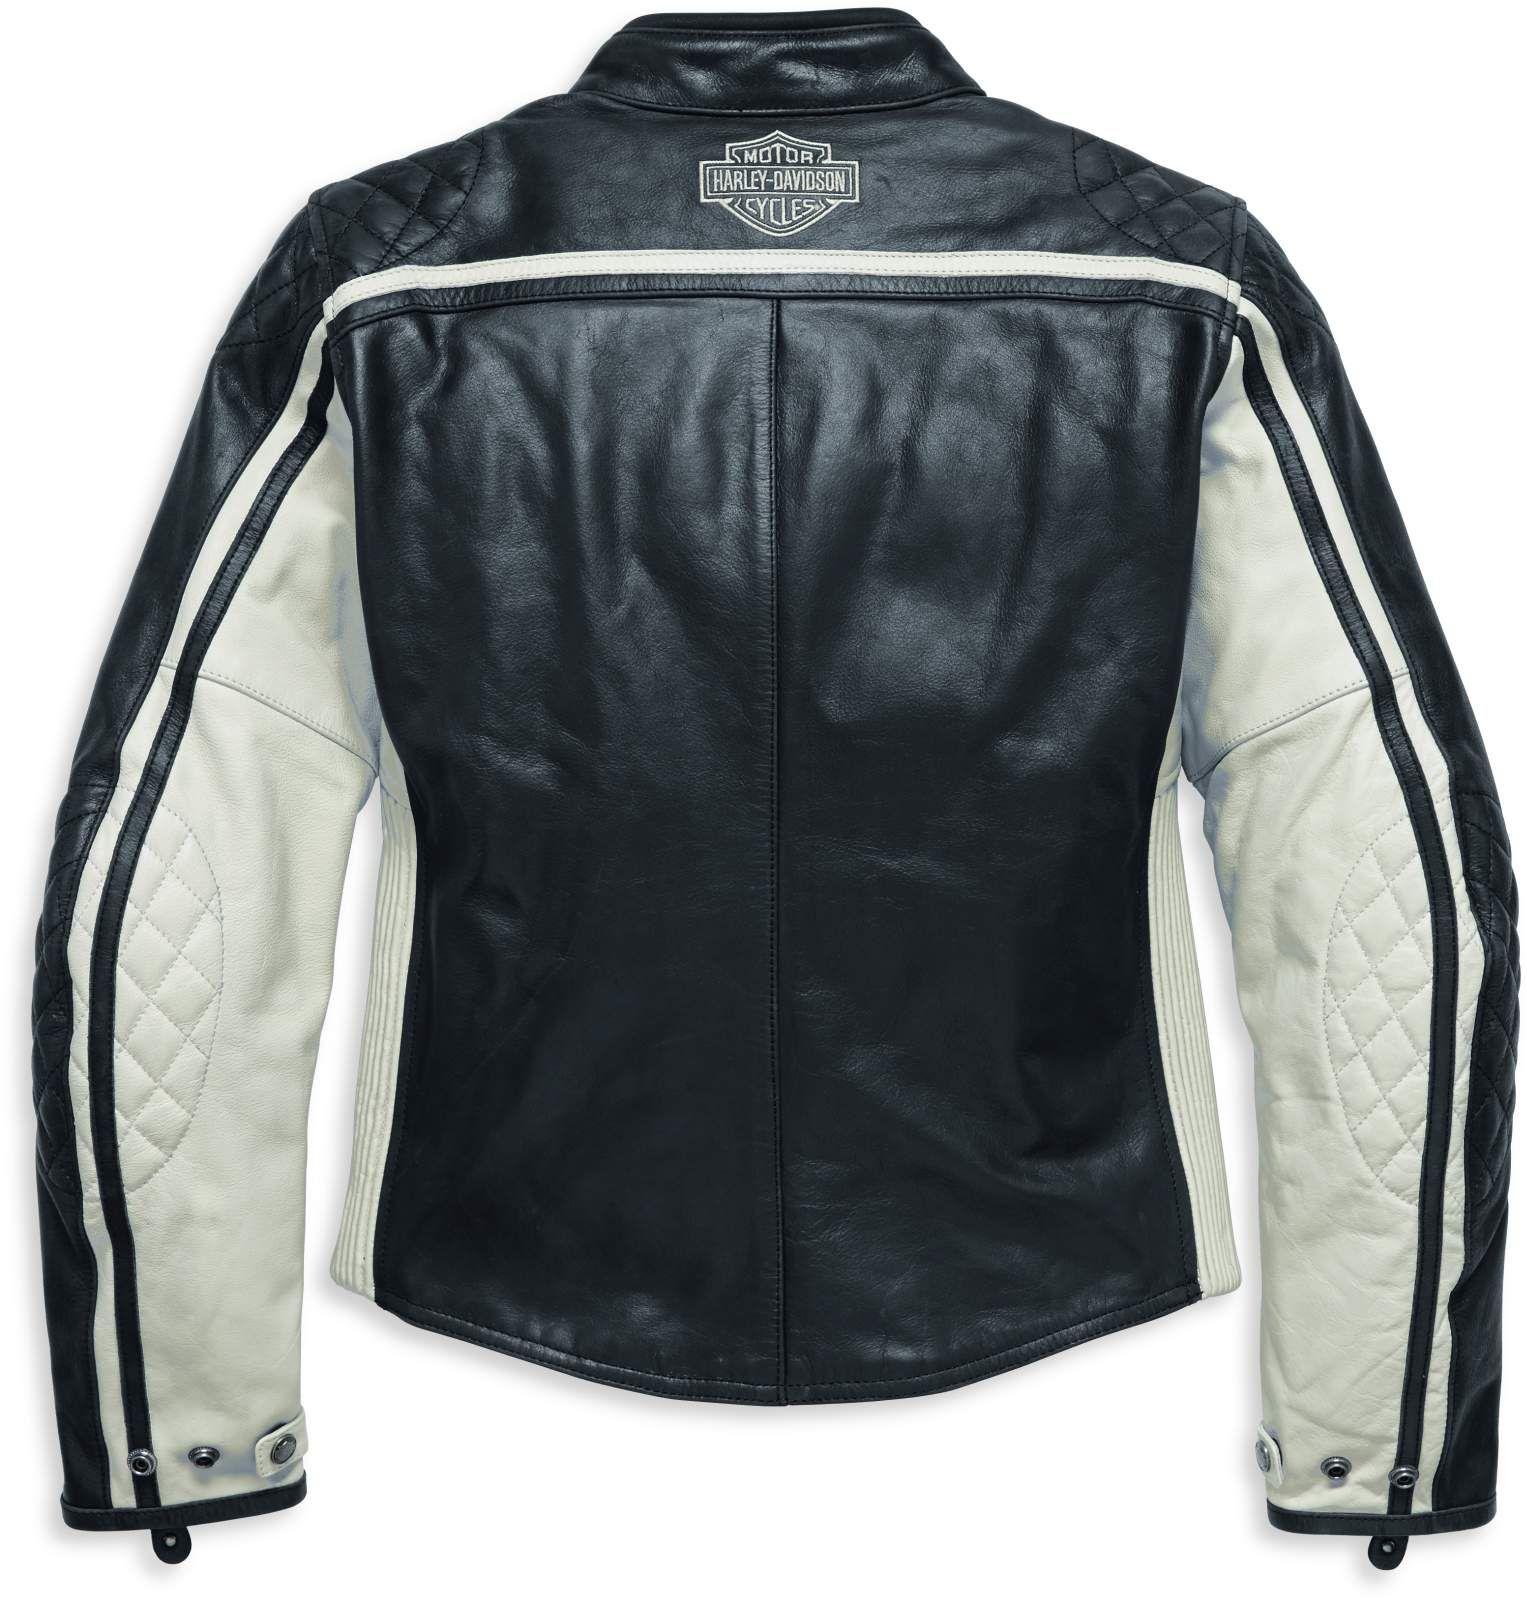 98130 17EW Harley Davidson Damen Lederjacke Relay EC im